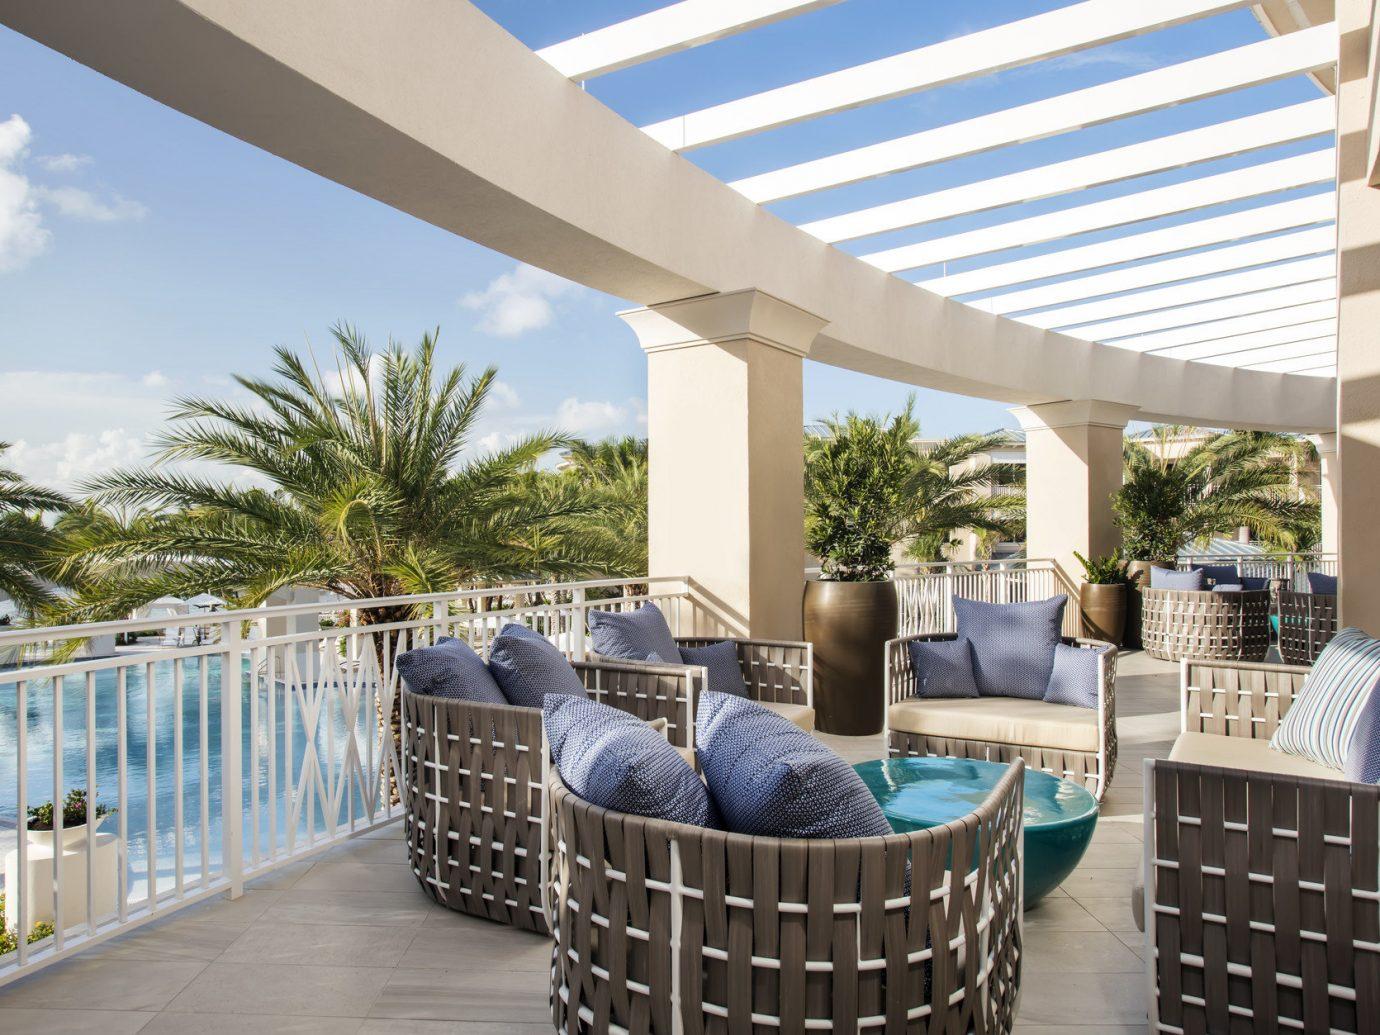 Beach chair property home estate condominium porch real estate outdoor structure interior design swimming pool backyard Villa furniture Deck